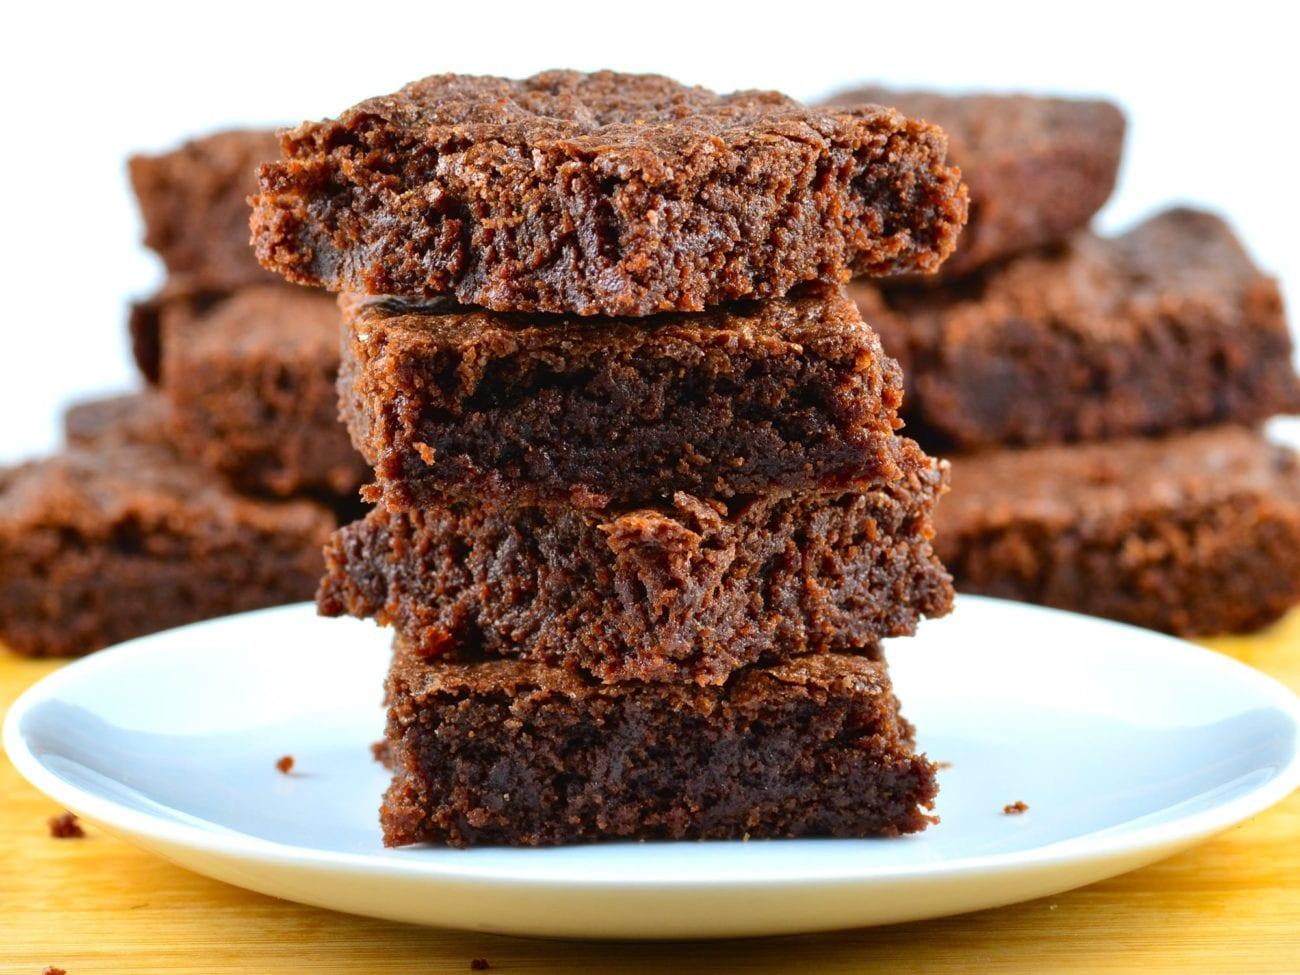 Ultimate chocolate brownies